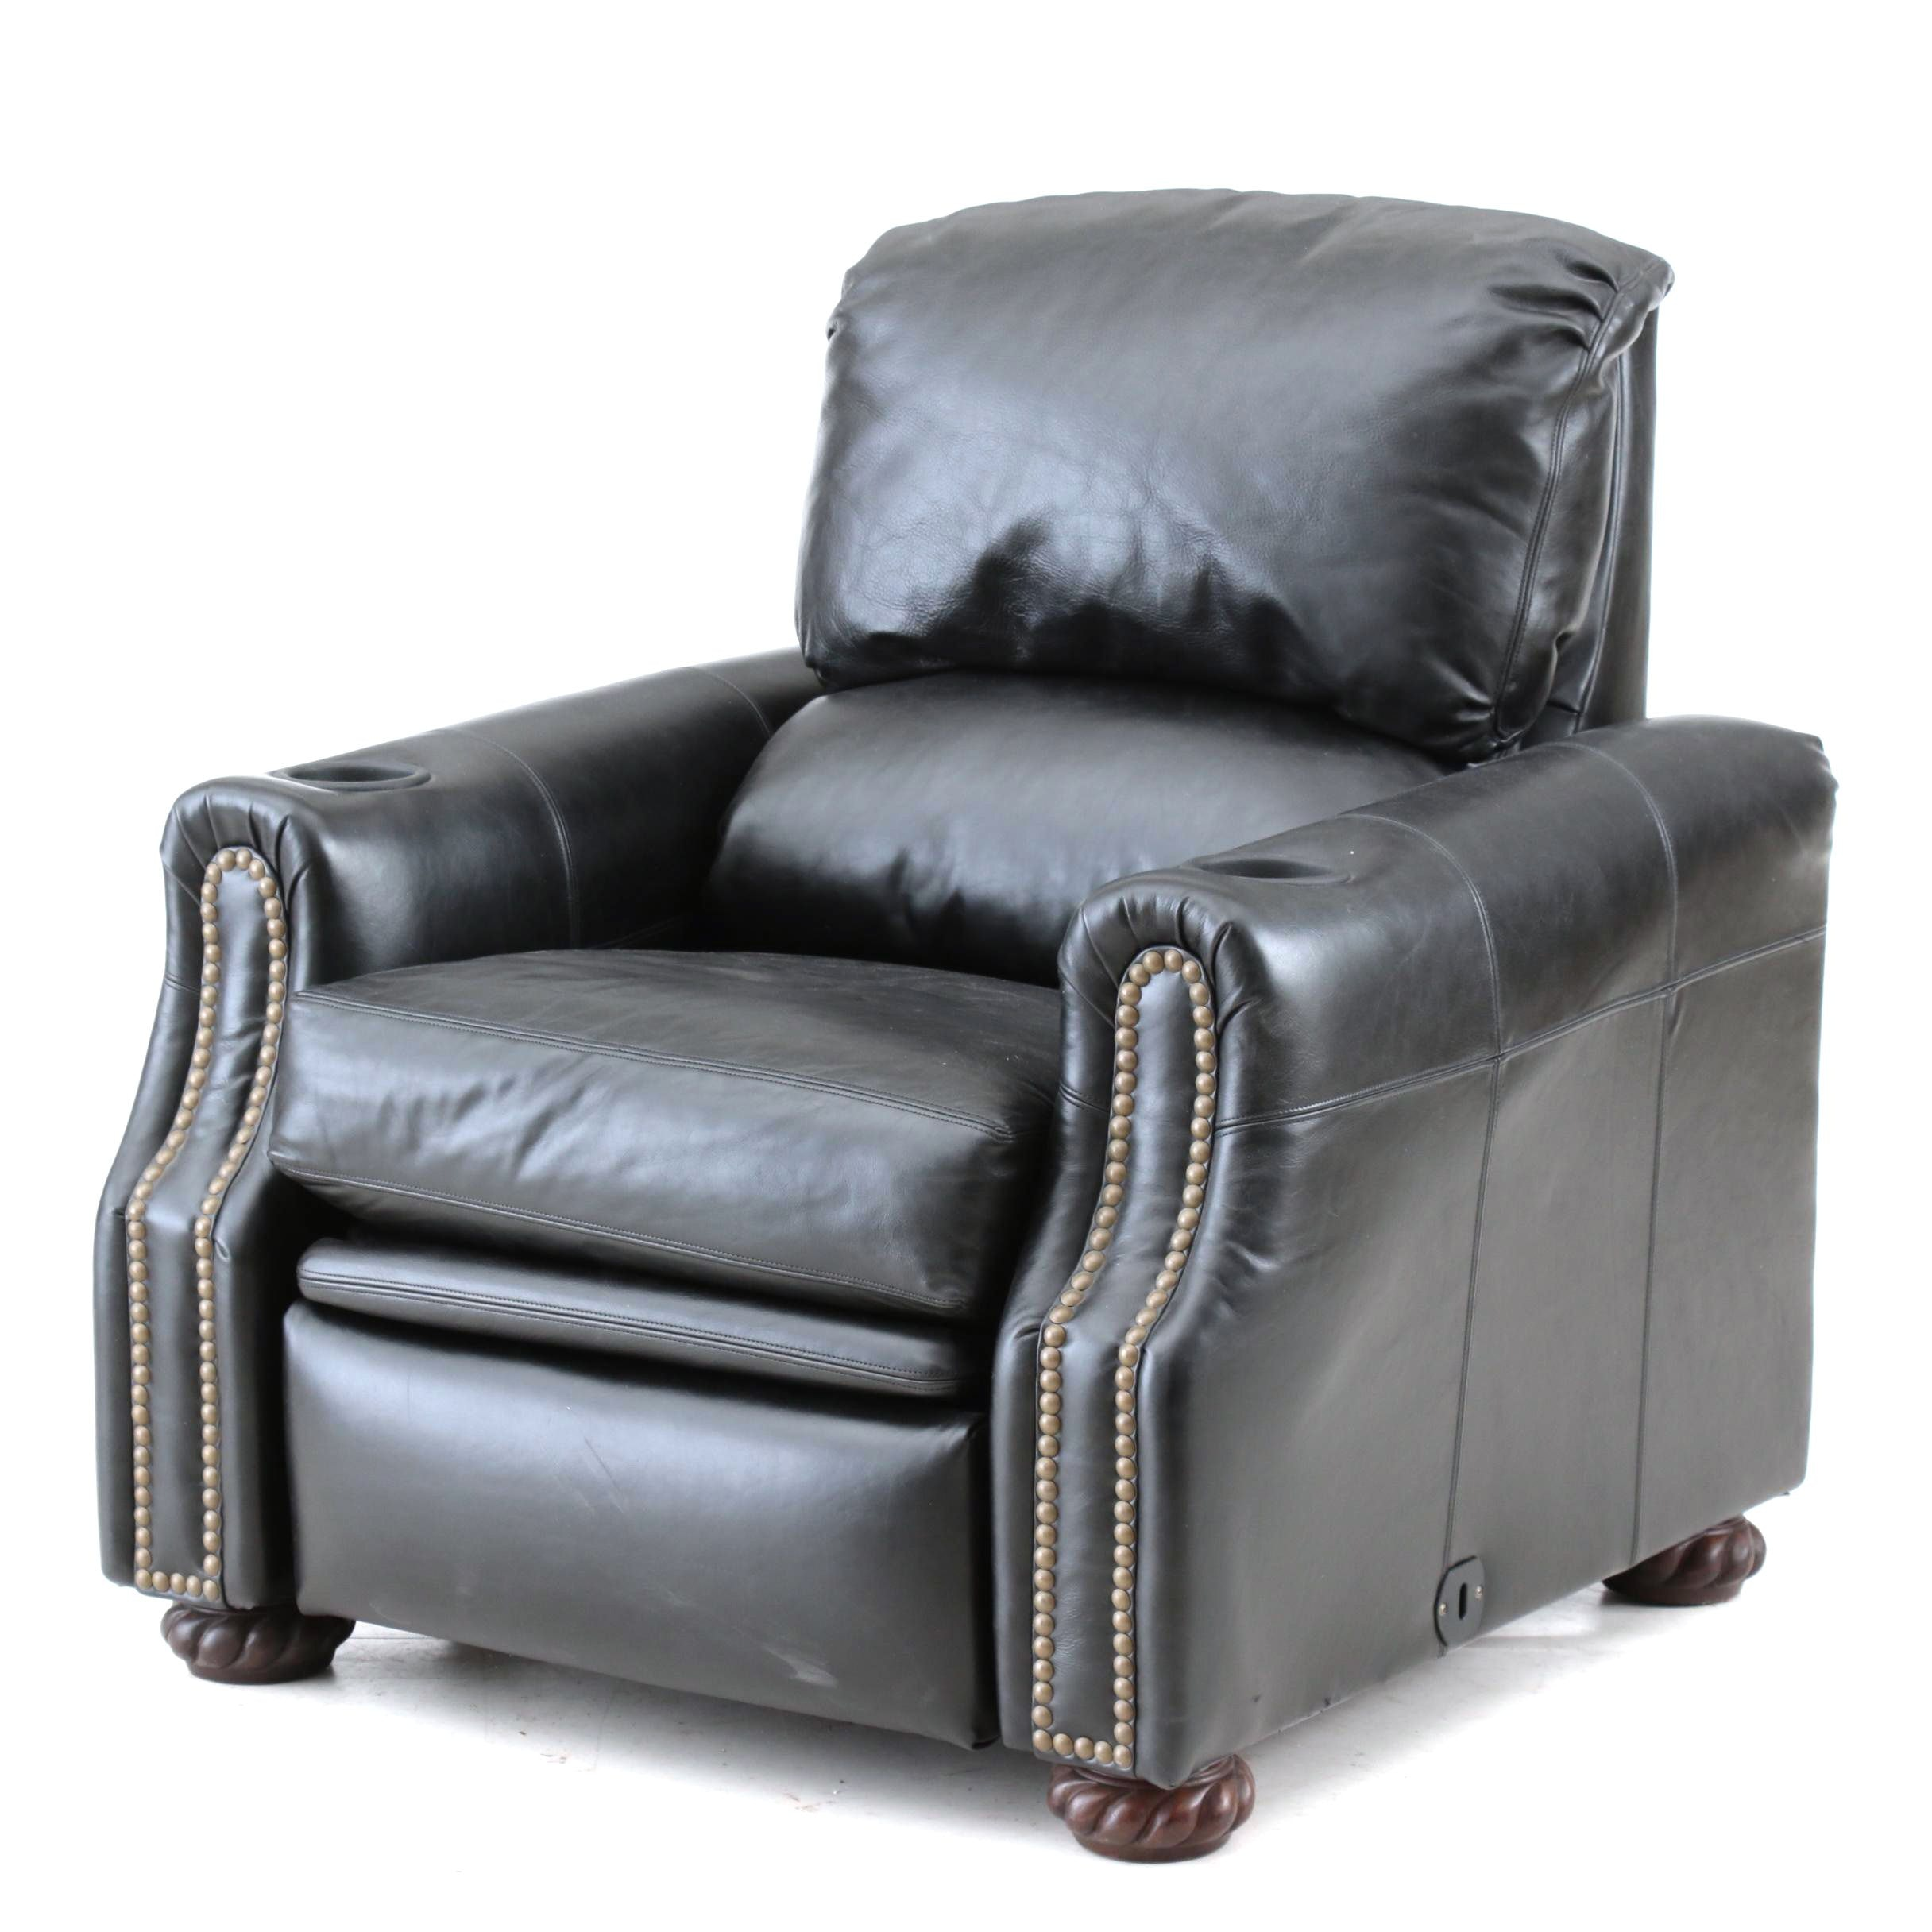 Drexel Heritage Black Leather Recliner